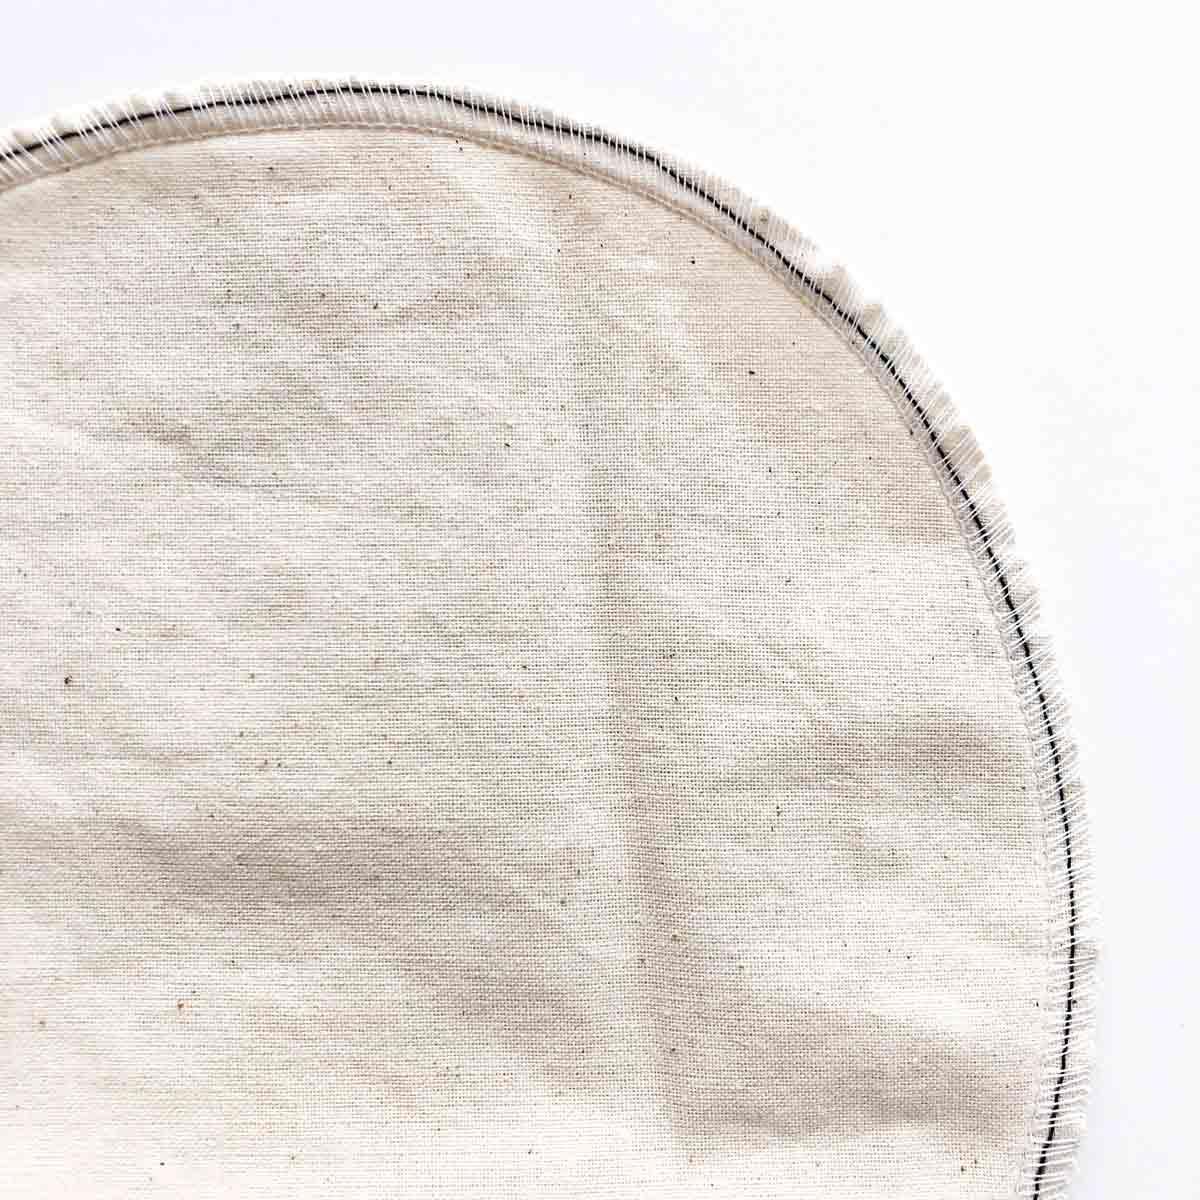 Basting stitch after serging